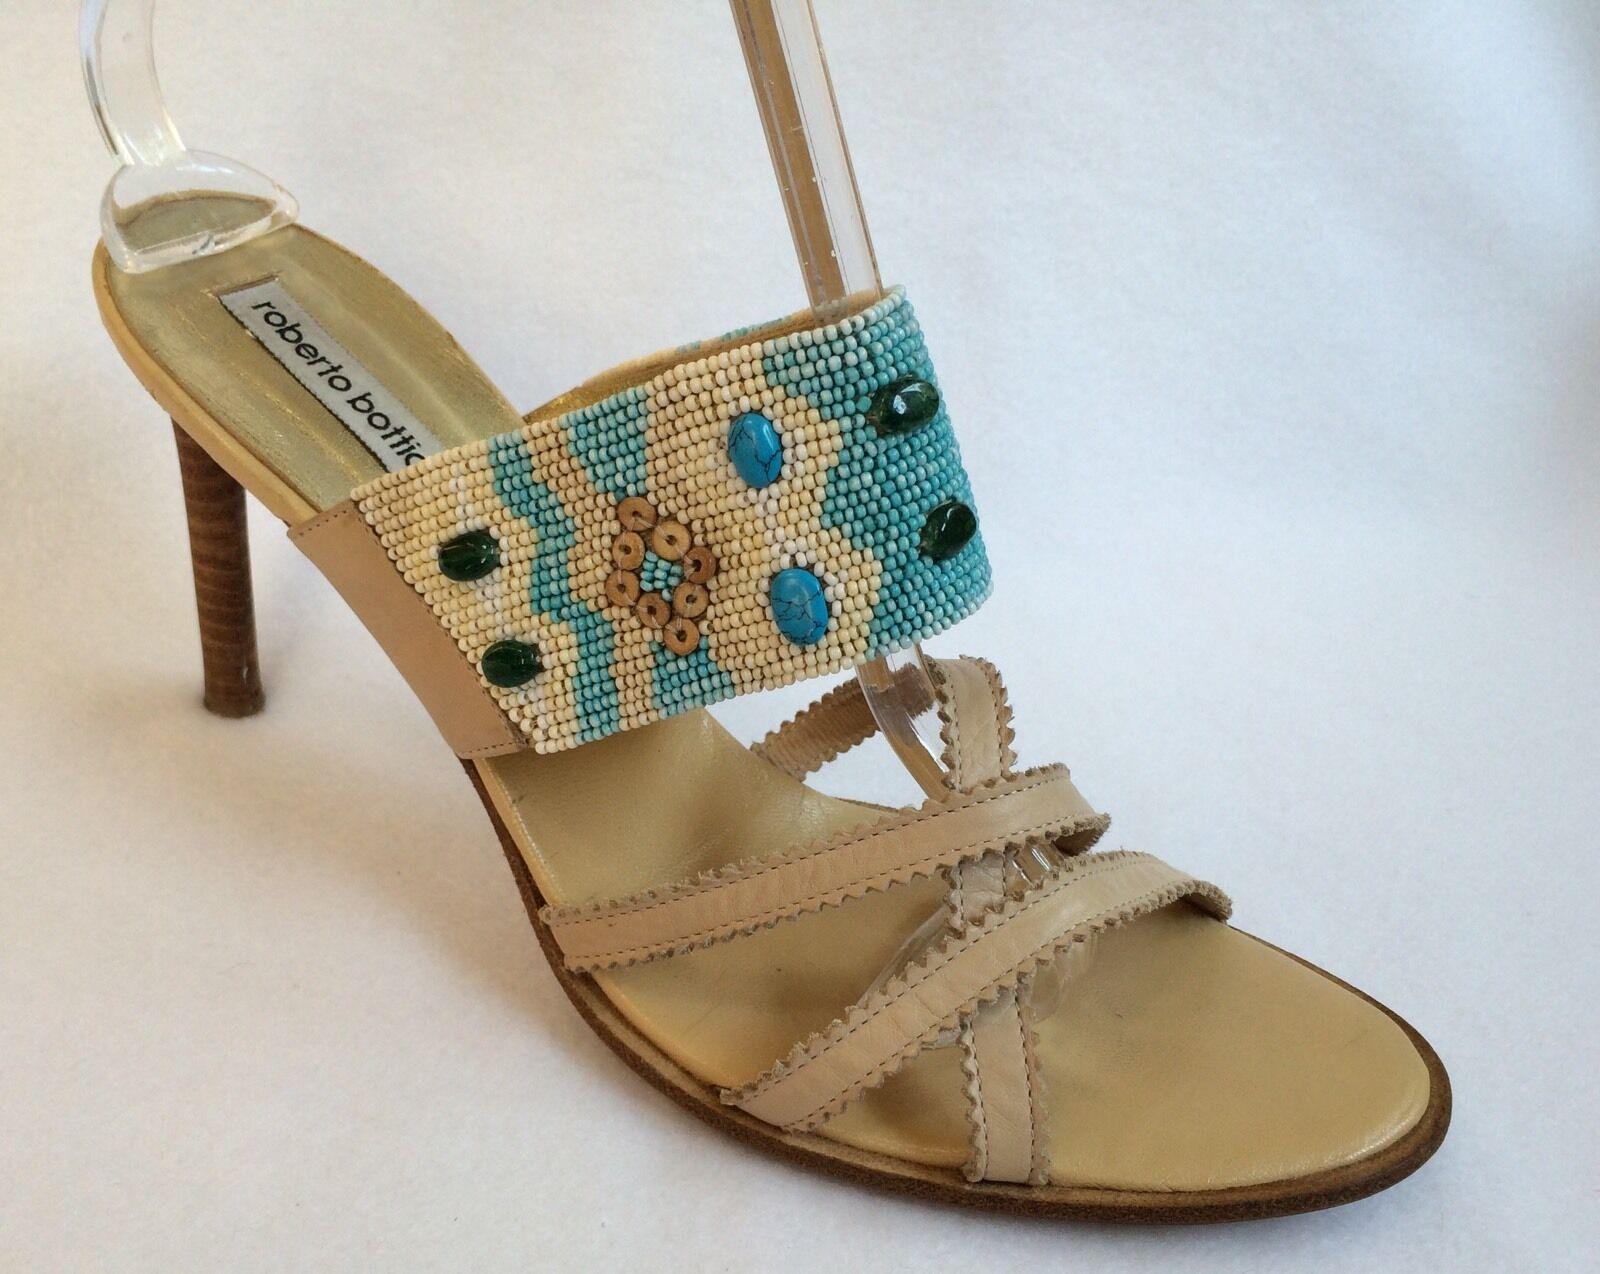 ROBERTO BOTTICELLI SZ 39   8.5 US Handmade Beaded Slip On Strappy High Heels EUC